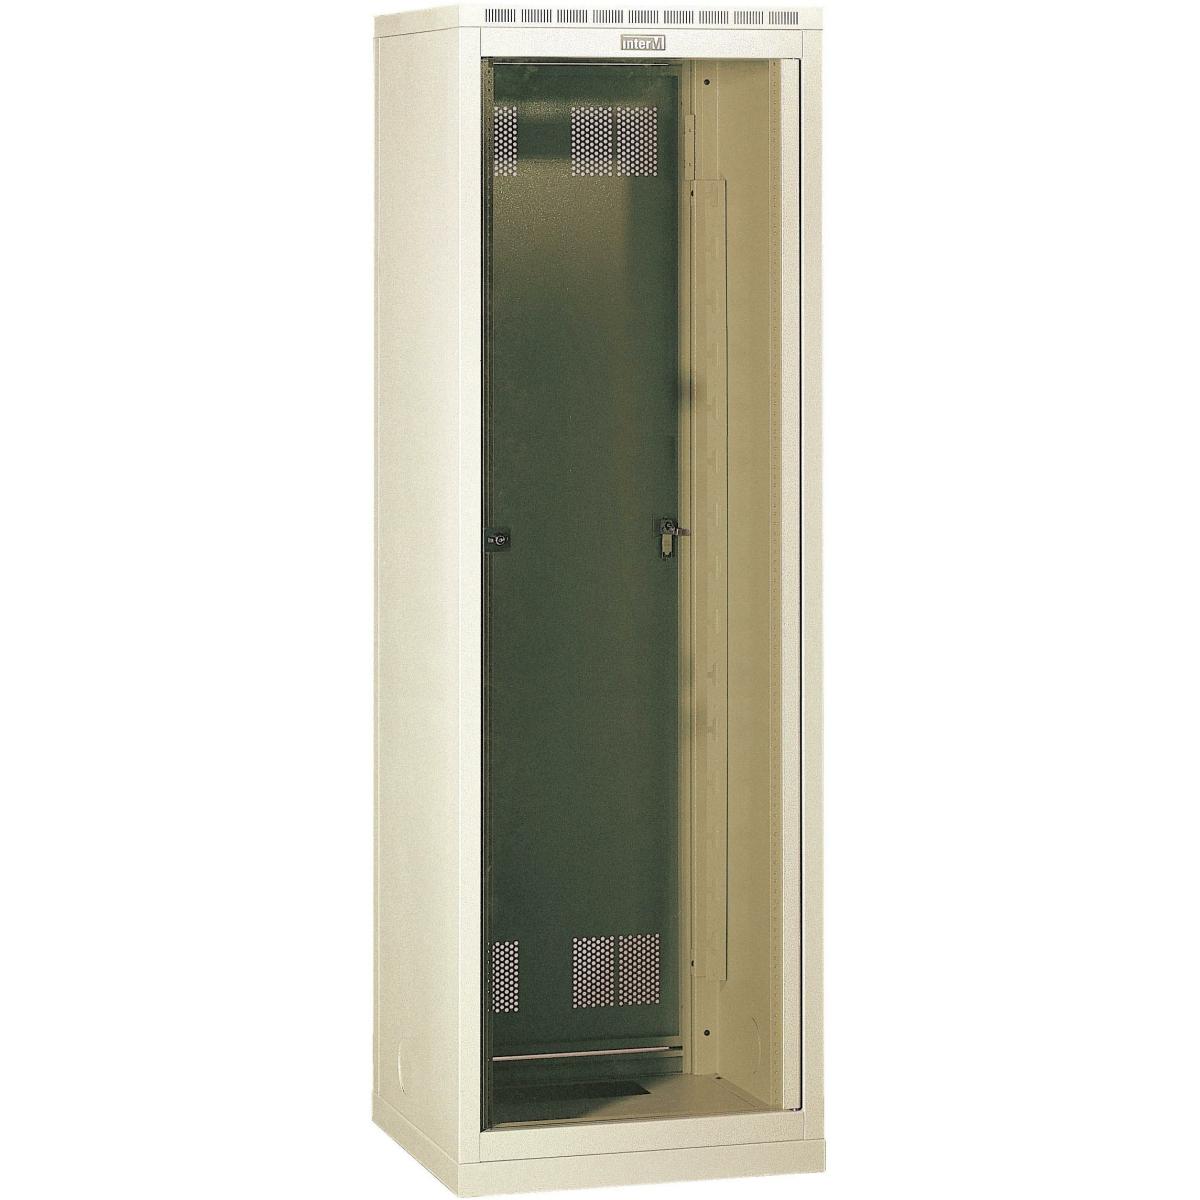 Шкаф аппаратный Inter-M Inter-M PR-331A 0 pr на 100